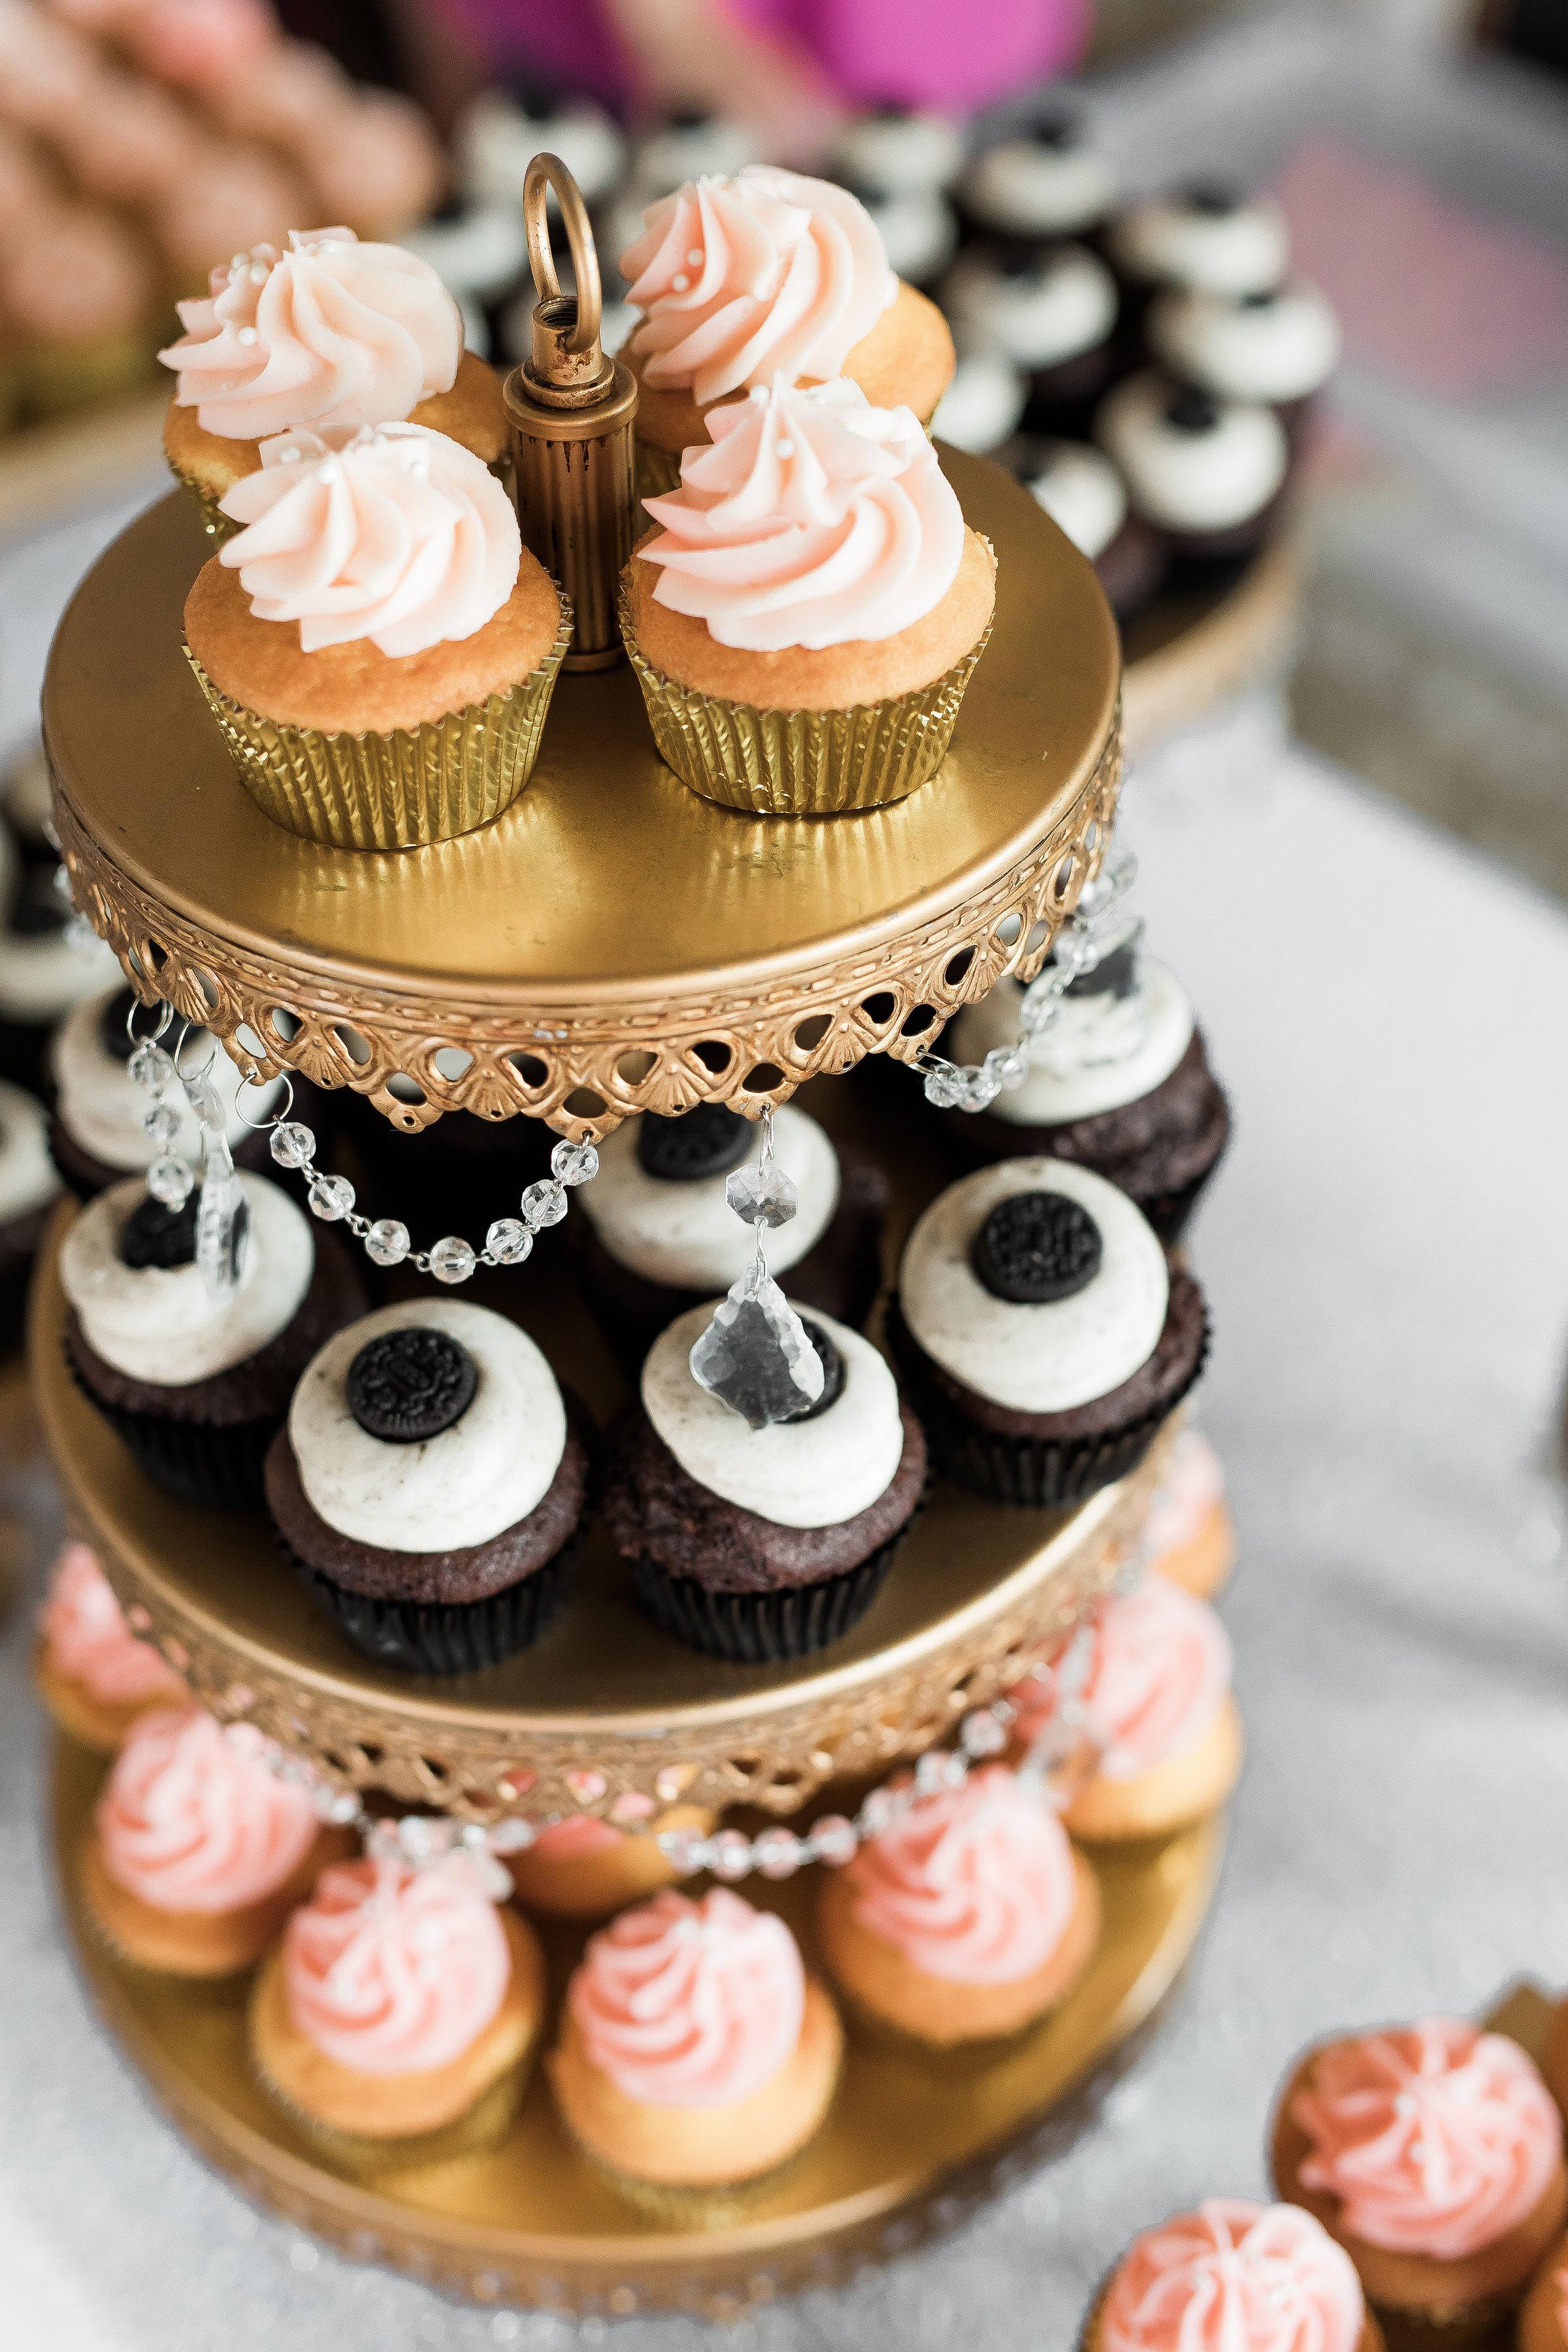 Classy Girl Cupcakes Piece of Cake 5K.JPG